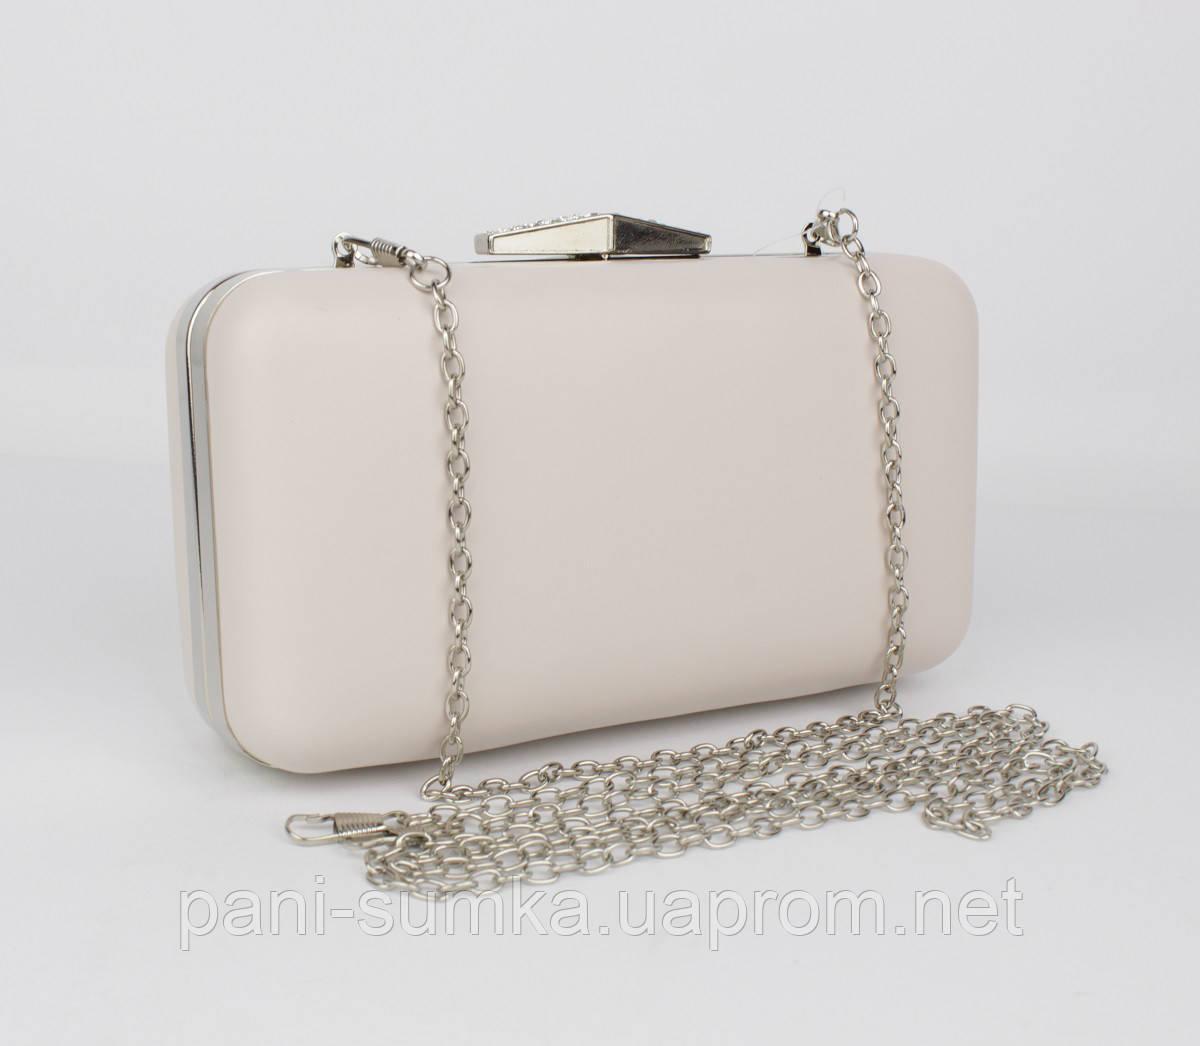 aa70e6de6c49 Вечерний клатч Rose Heart 09829-2 светло-бежевый, сумочка на цепочке -  Интернет